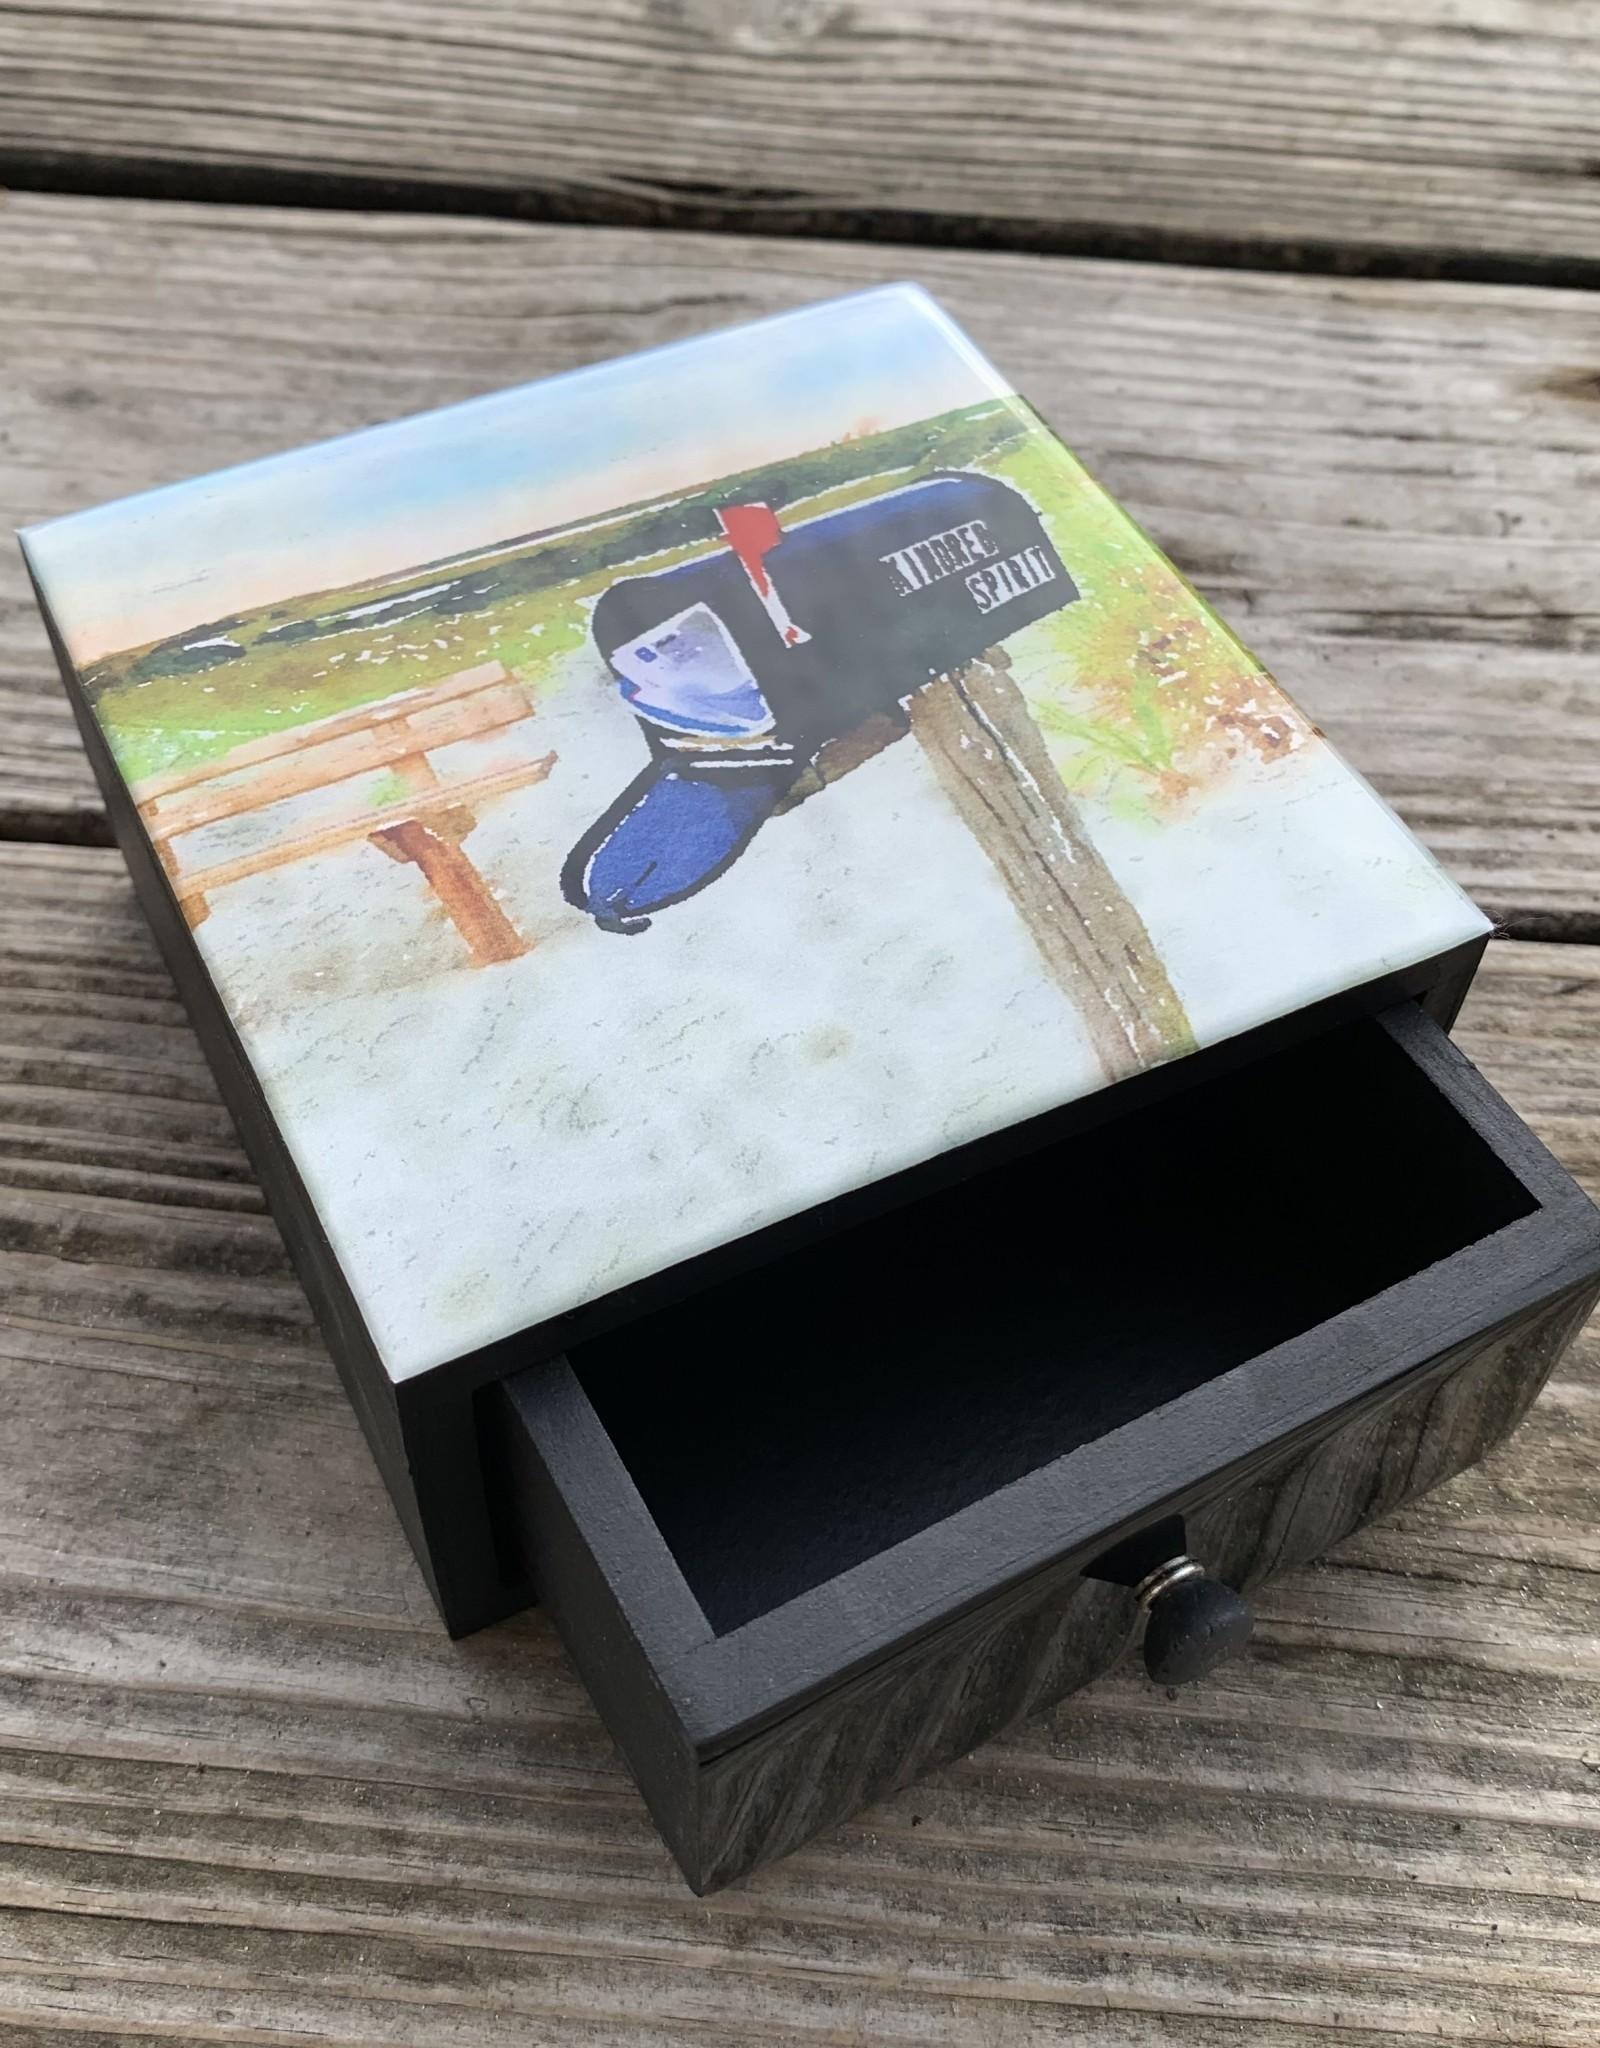 BOUTIQUE BOX KINDRED SPIRIT WATERCOLOR